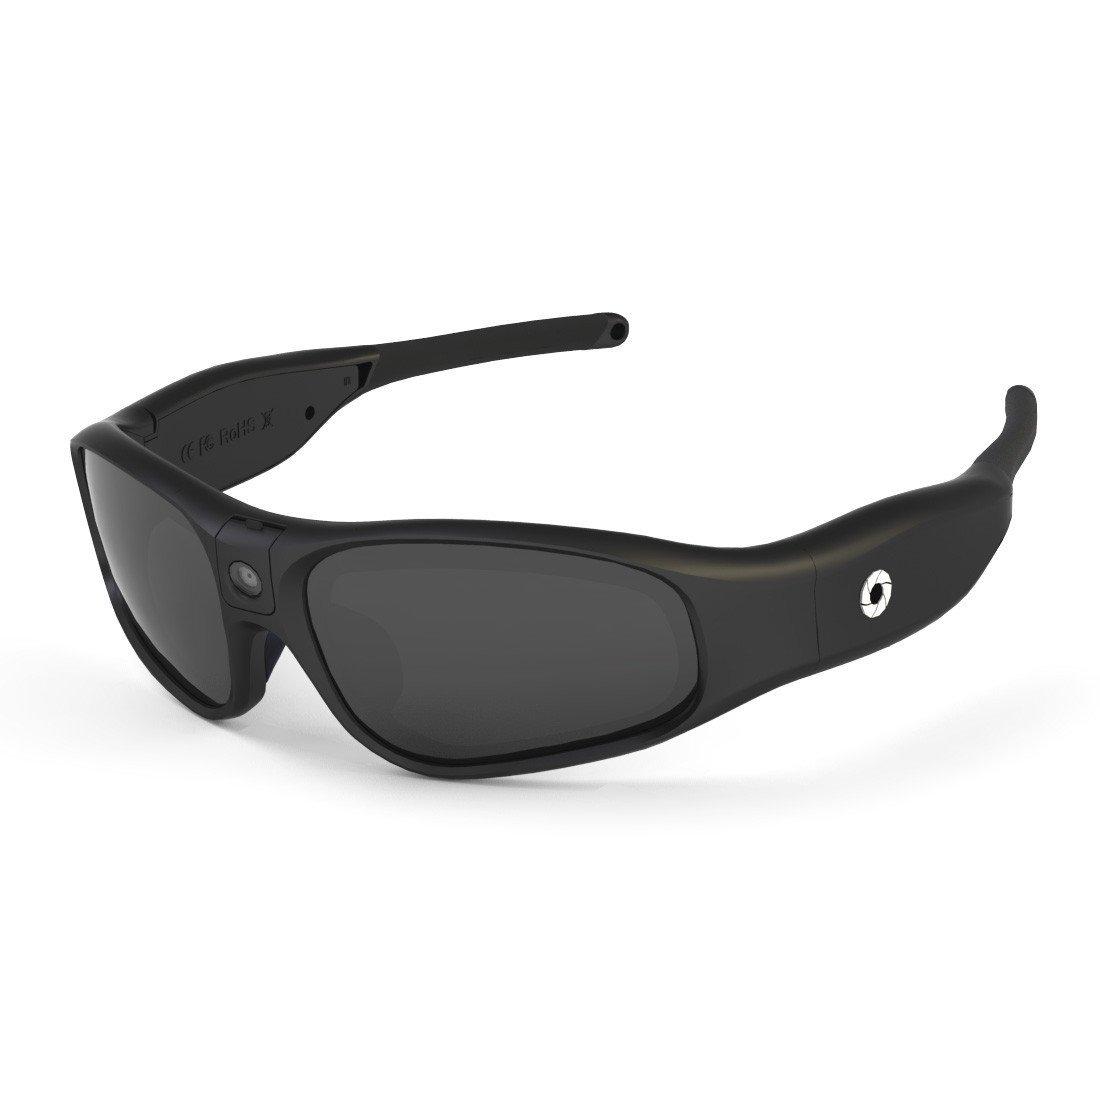 17feee43bf Amazon.com   iVUE Rincon 1080P HD Camera Glasses Video Recording Sport  Sunglasses DVR Eyewear (Tilt Lens